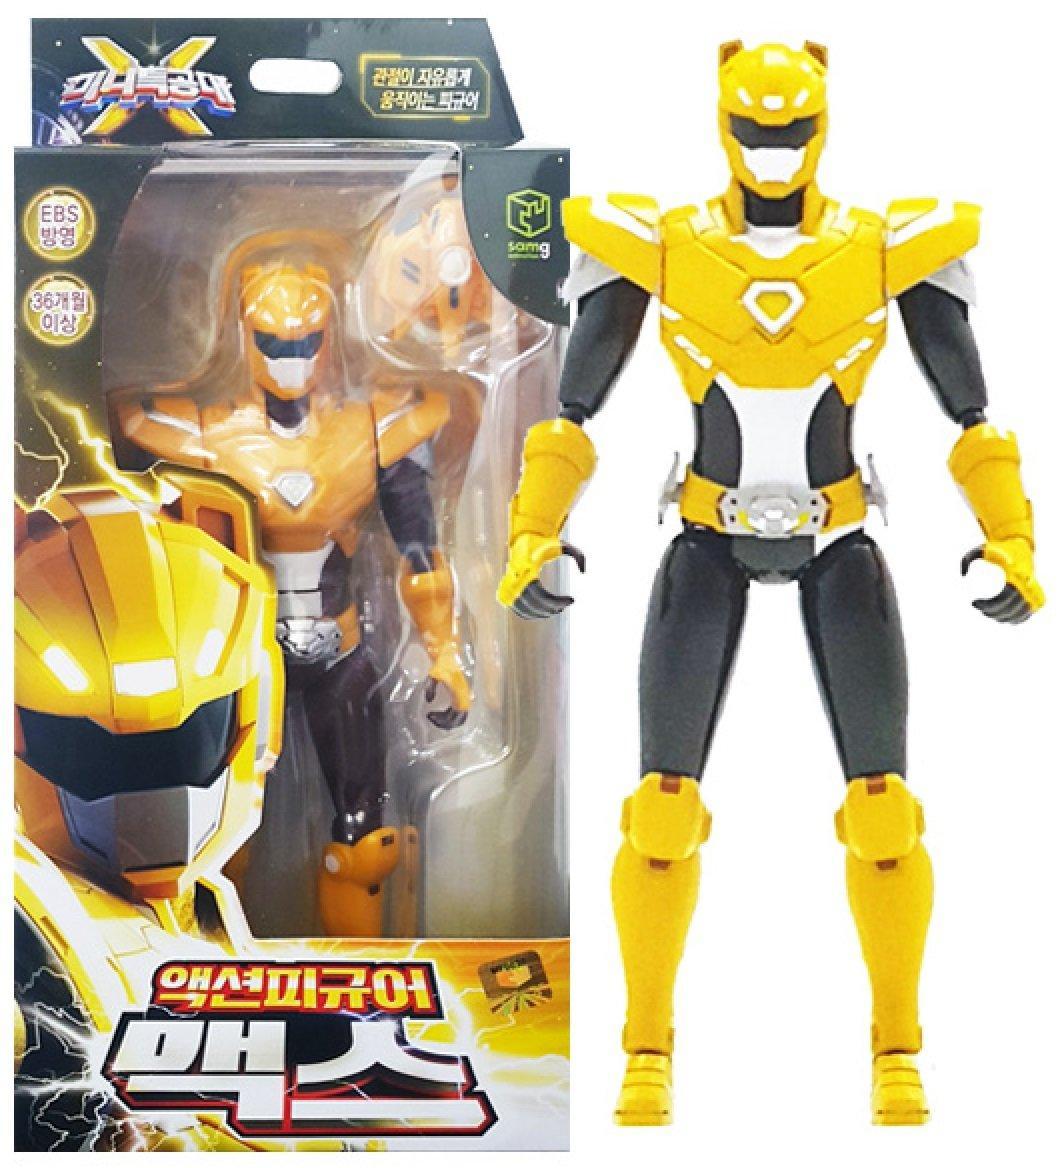 Фигурка игрушка робот Мини Форс Х Макс Miniforce X Max Korean Robot